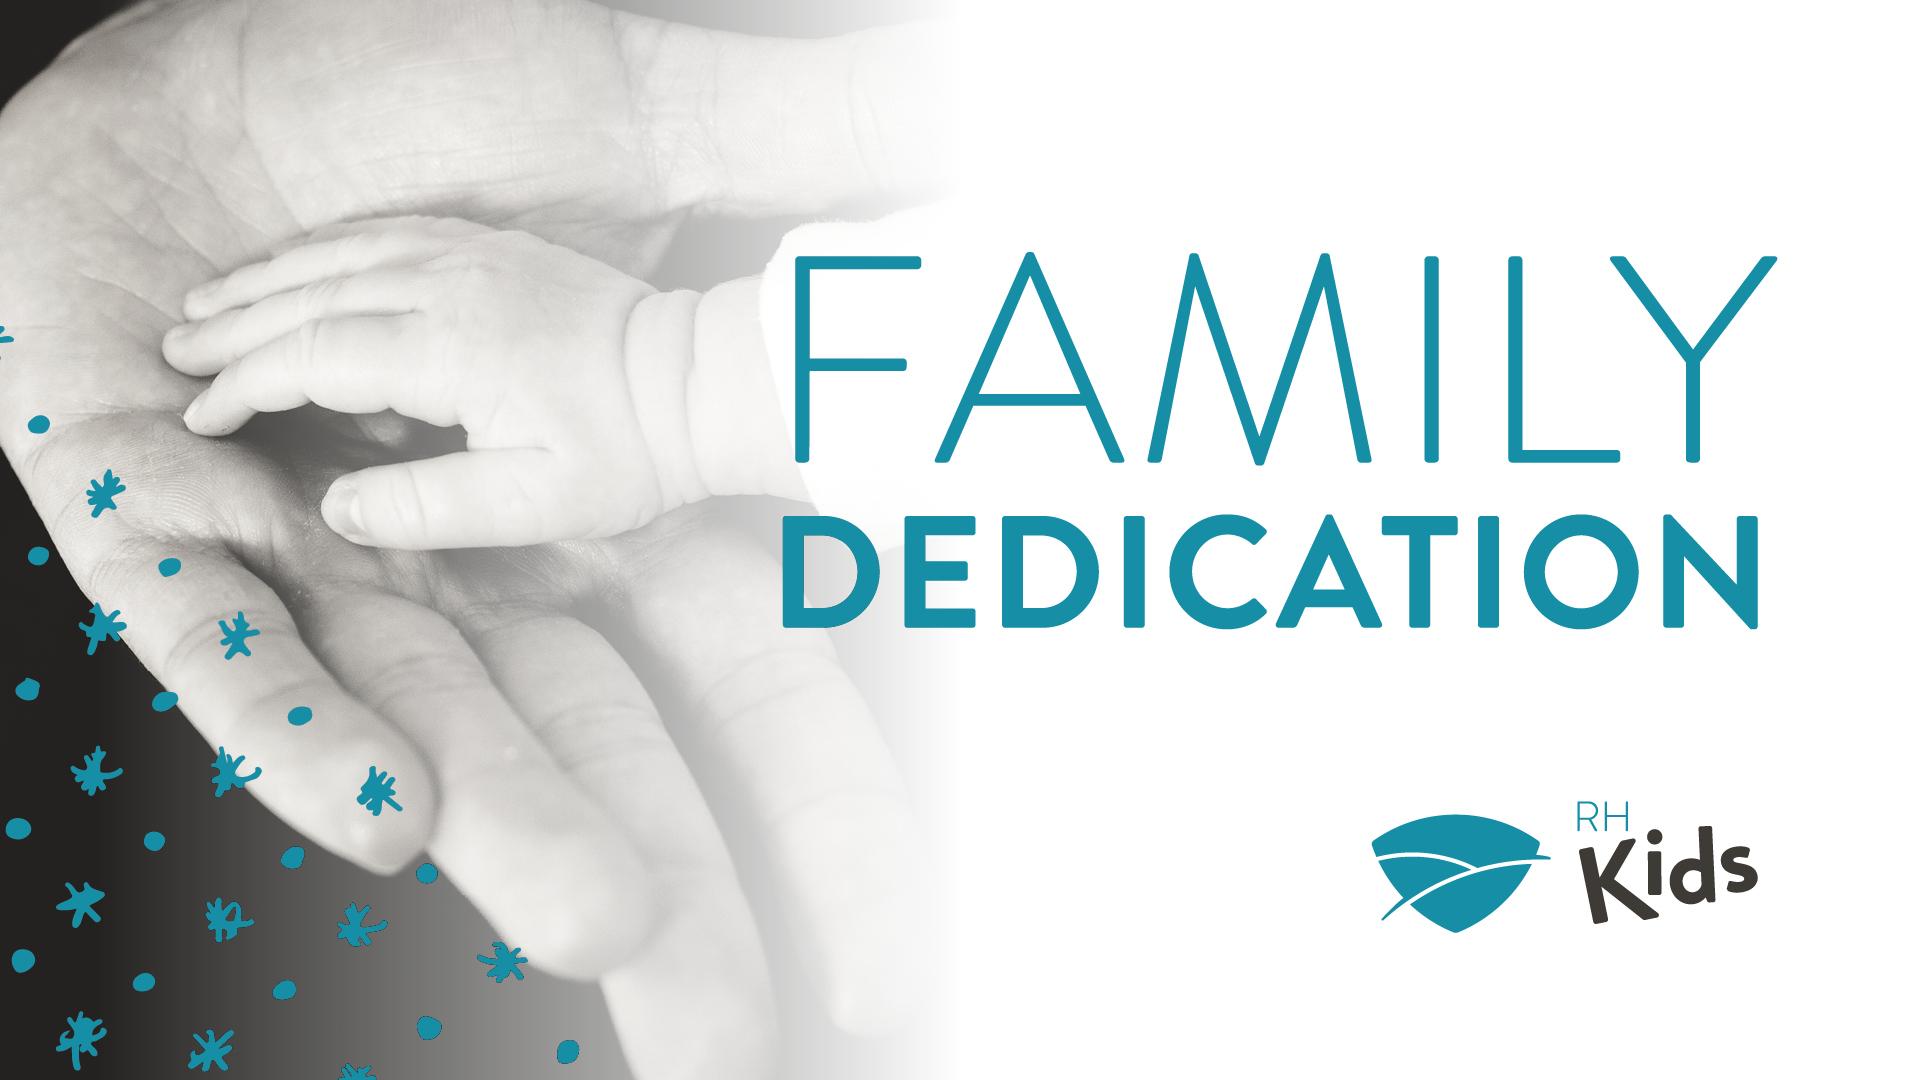 Family dedication 2016 event banner